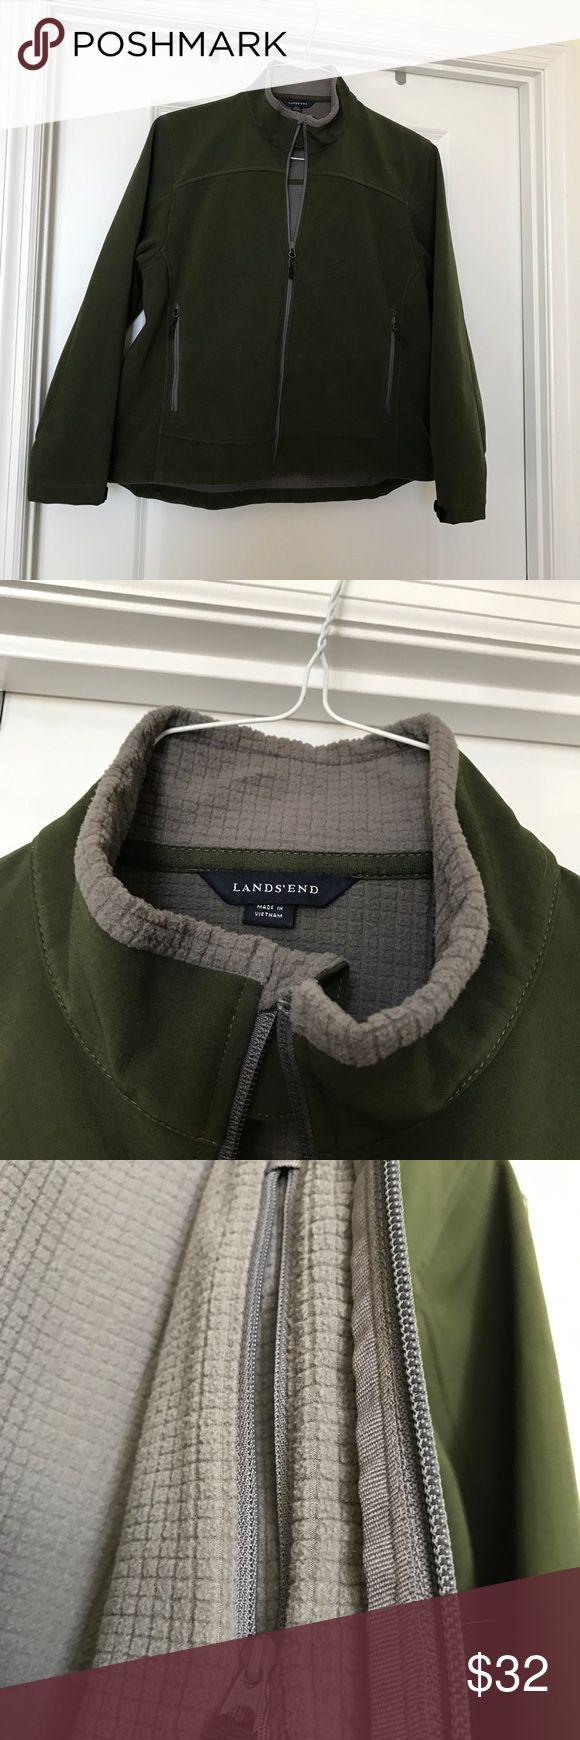 Women's Regular Soft Shell Jacket Green Lands End jacket lightly worn a handful of times Lands' End Jackets & Coats Utility Jackets